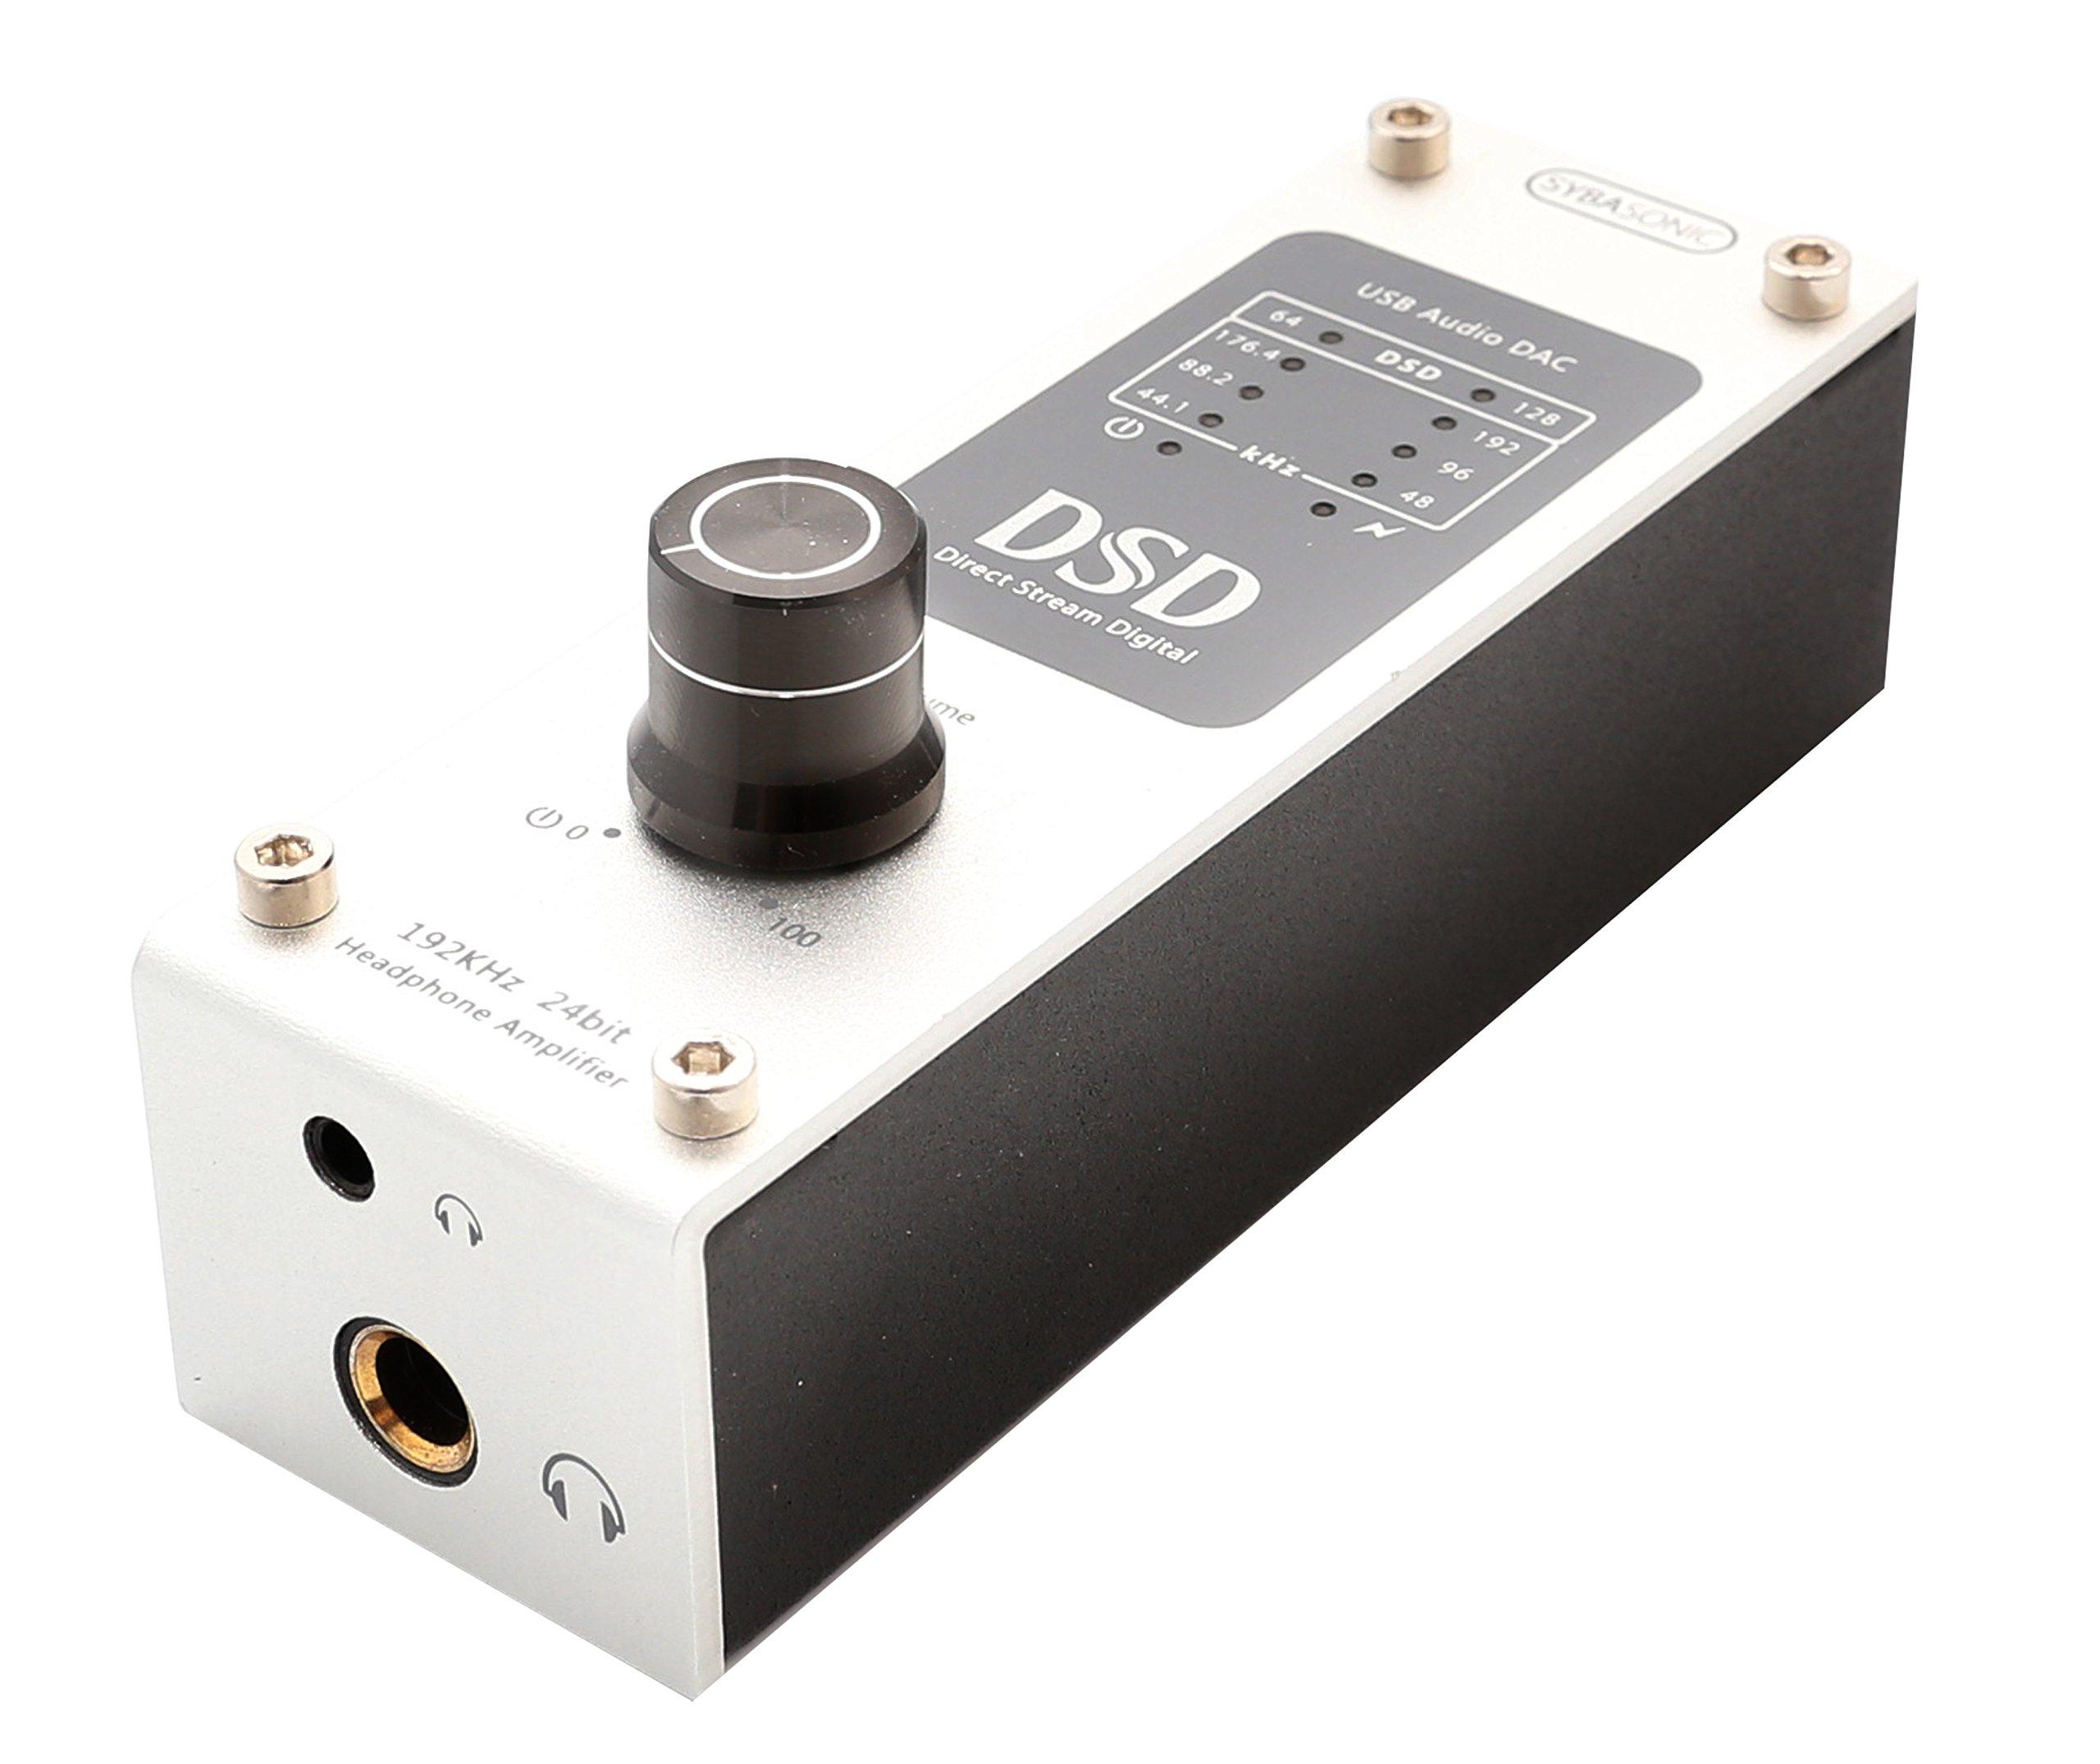 Portable USB 24bit Headphone Amplifier